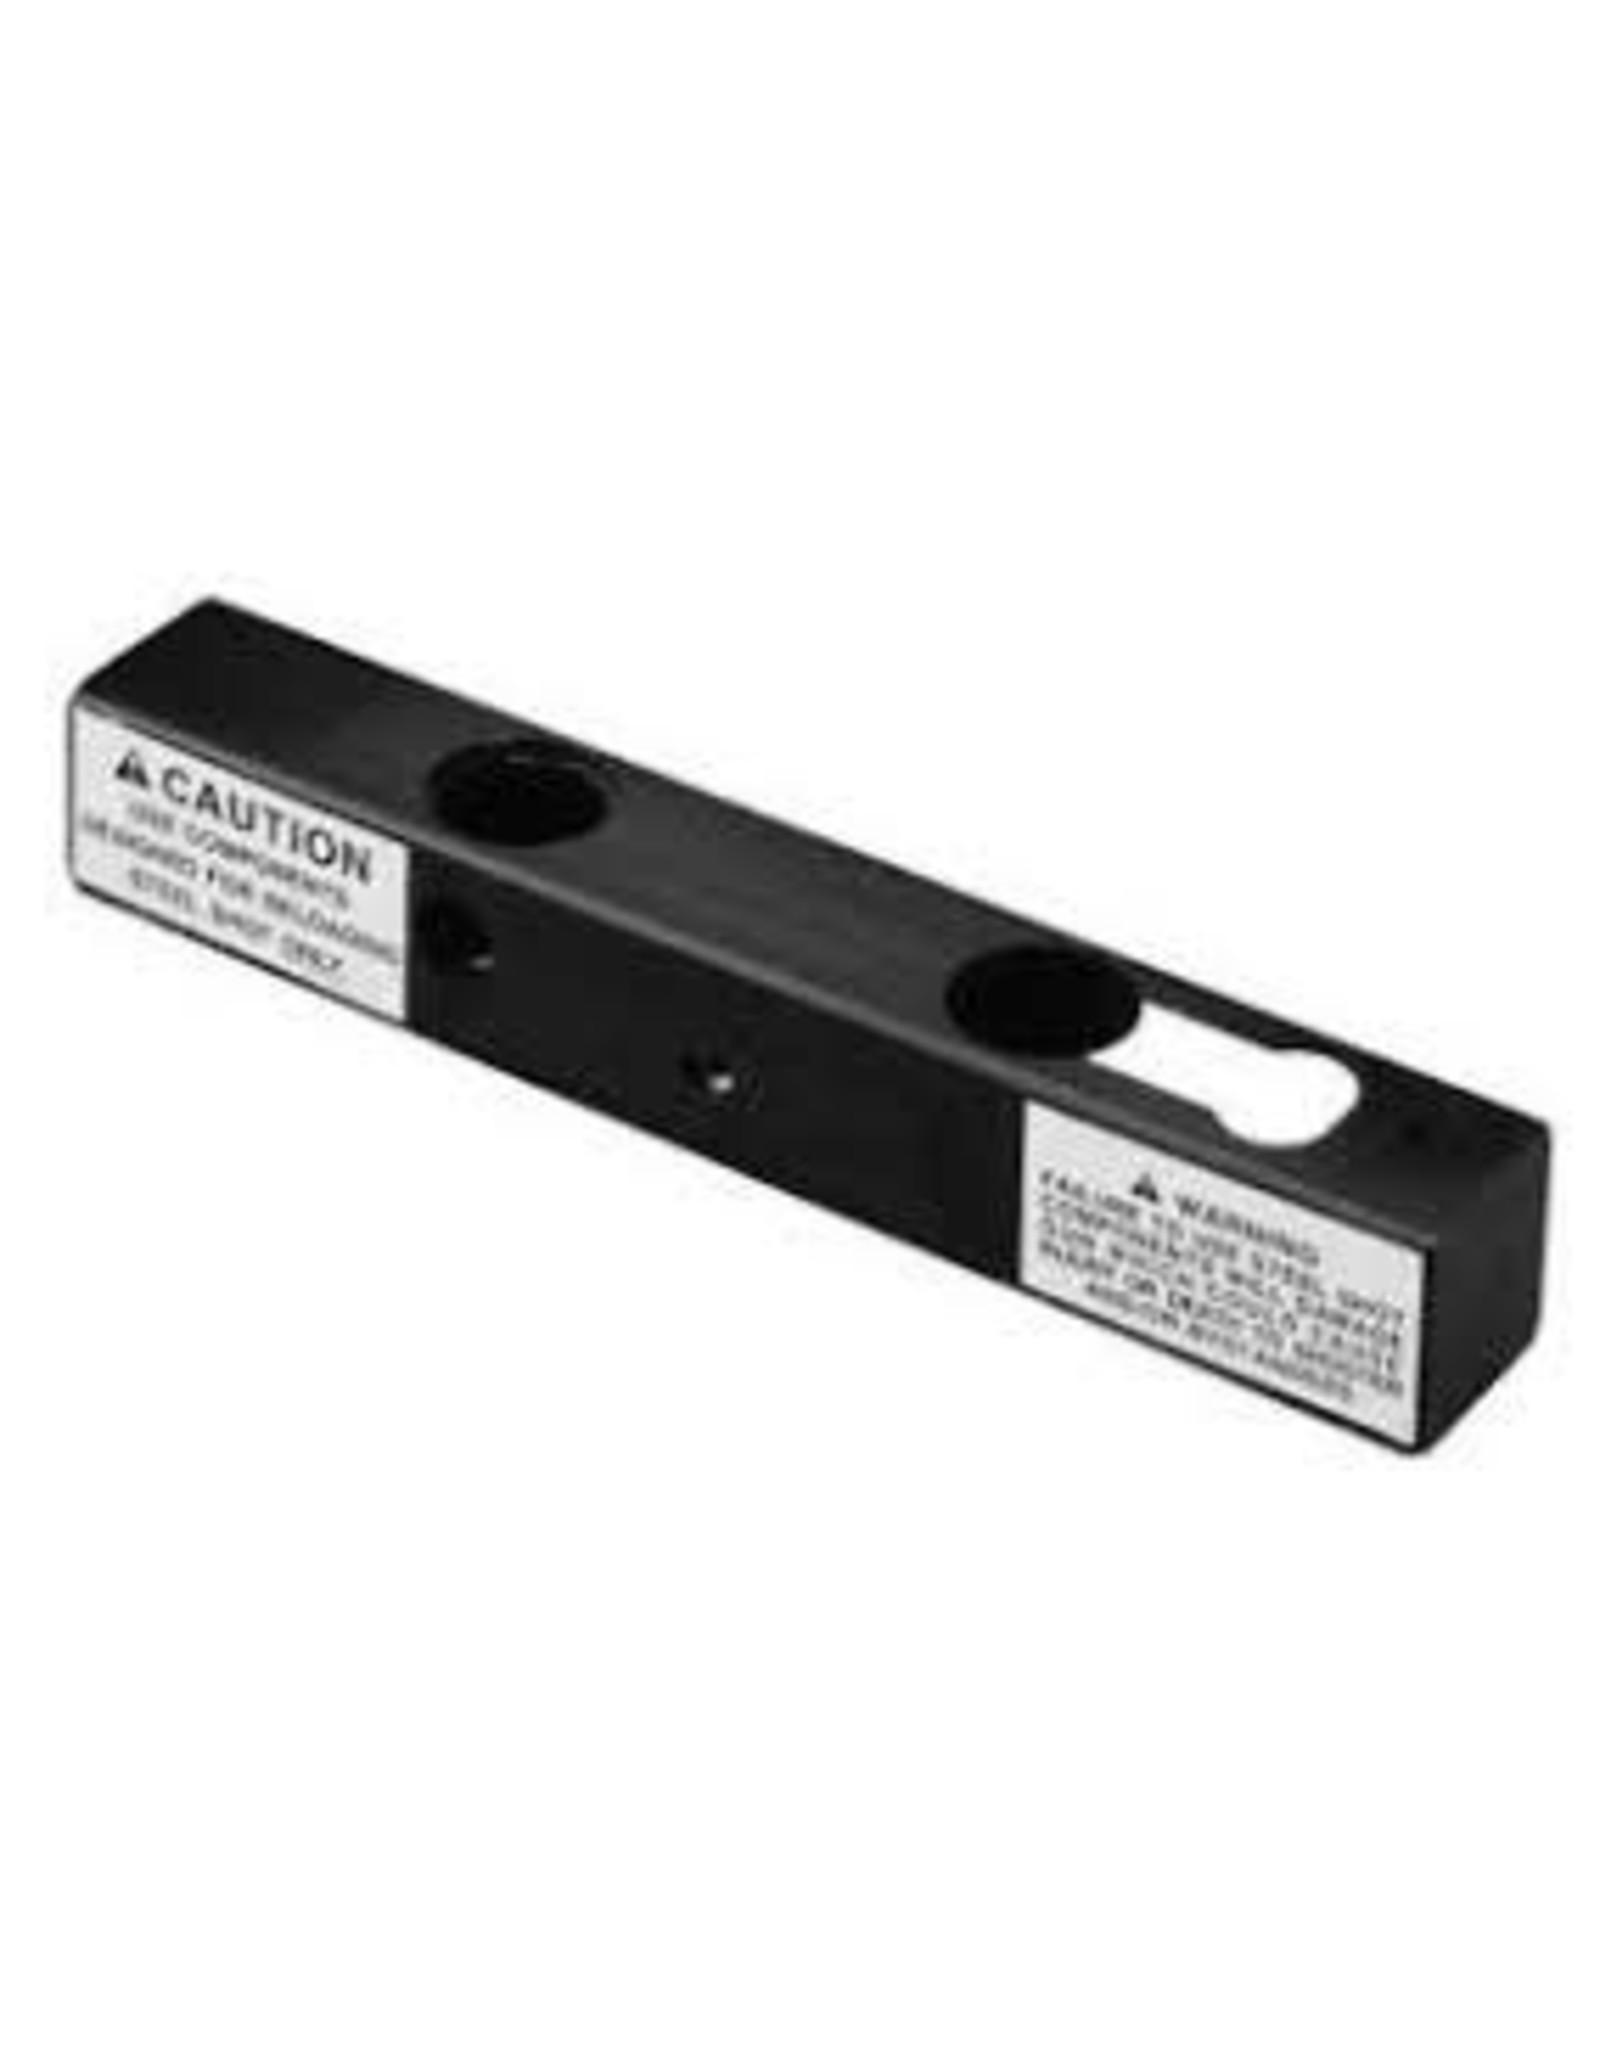 MEC MEC Steel Charge Bar 1-1/8 OZ #4 - #6